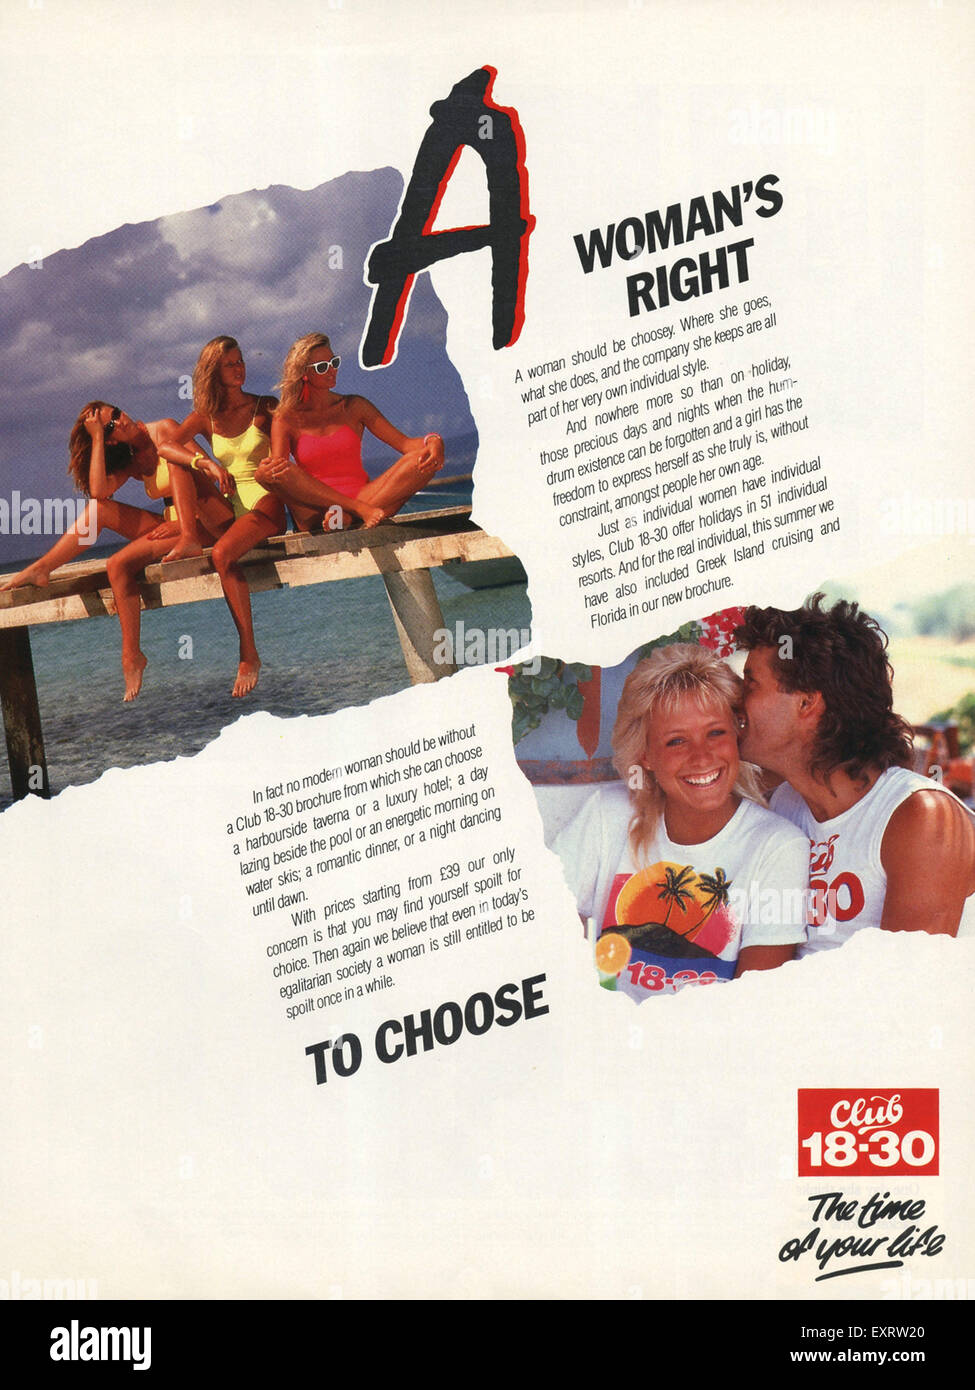 1980s UK Club 18-30 Magazine Advert - Stock Image